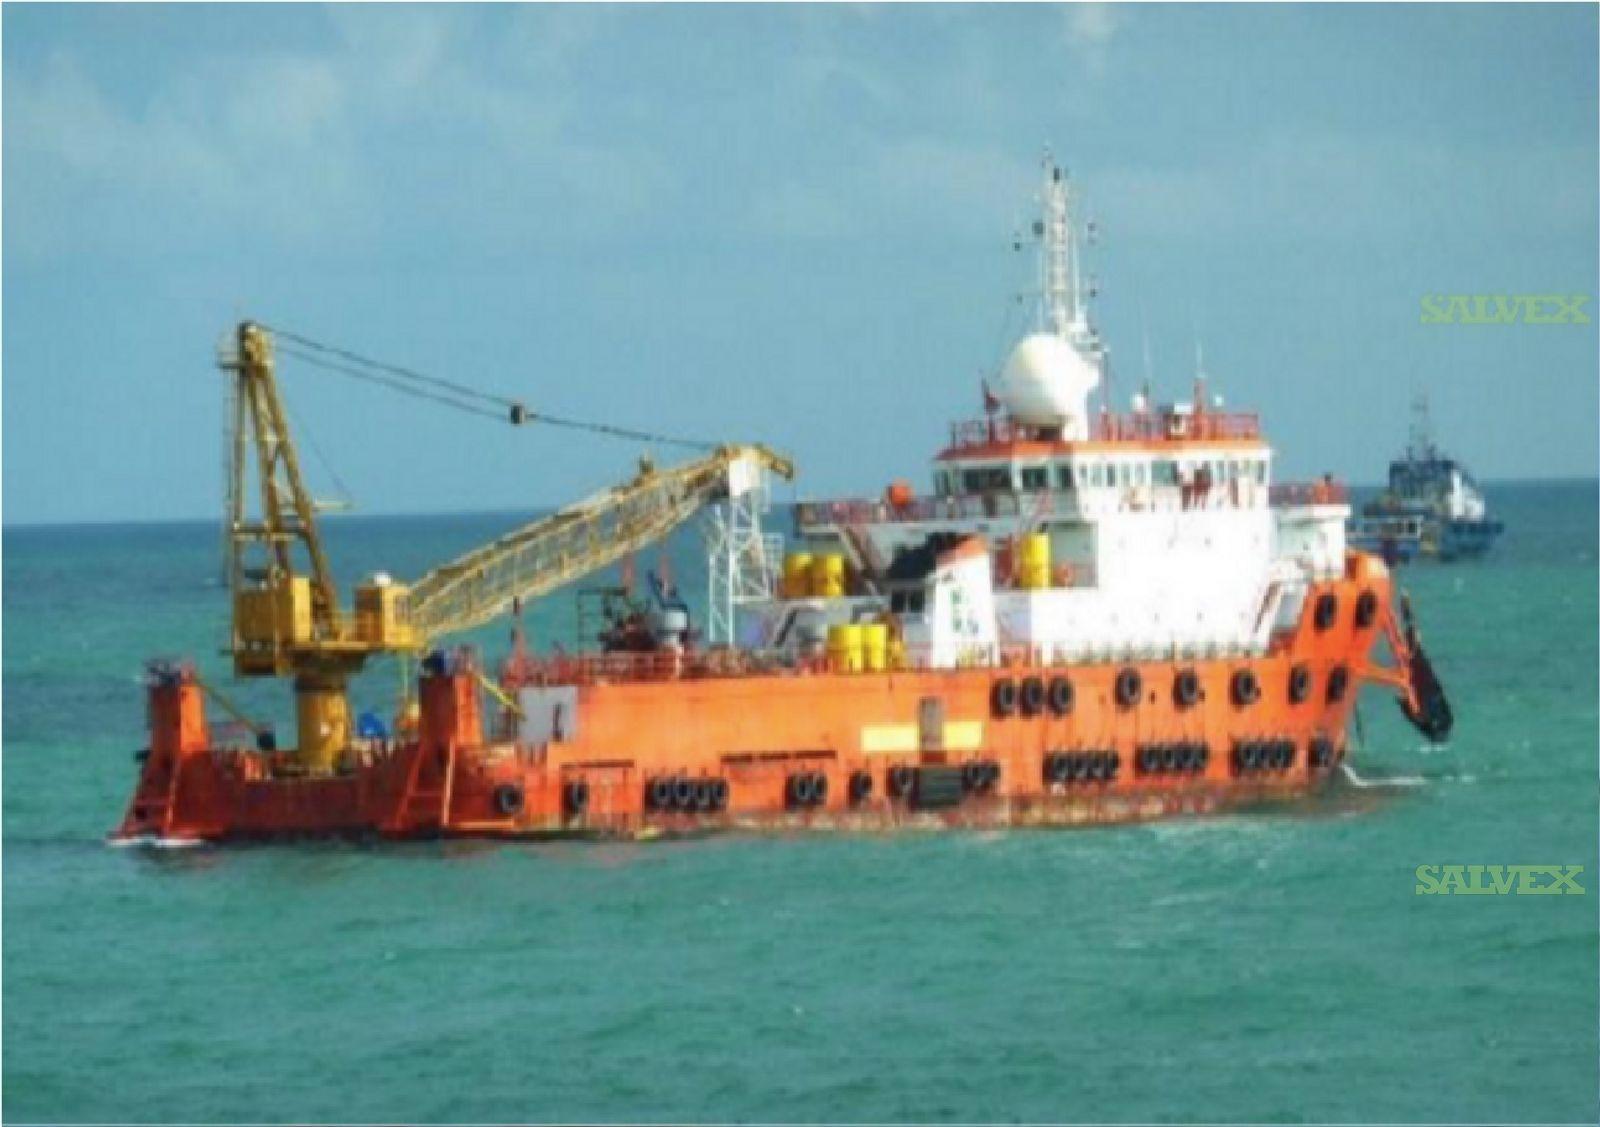 2004 74M Accommodation/ Work Vessel